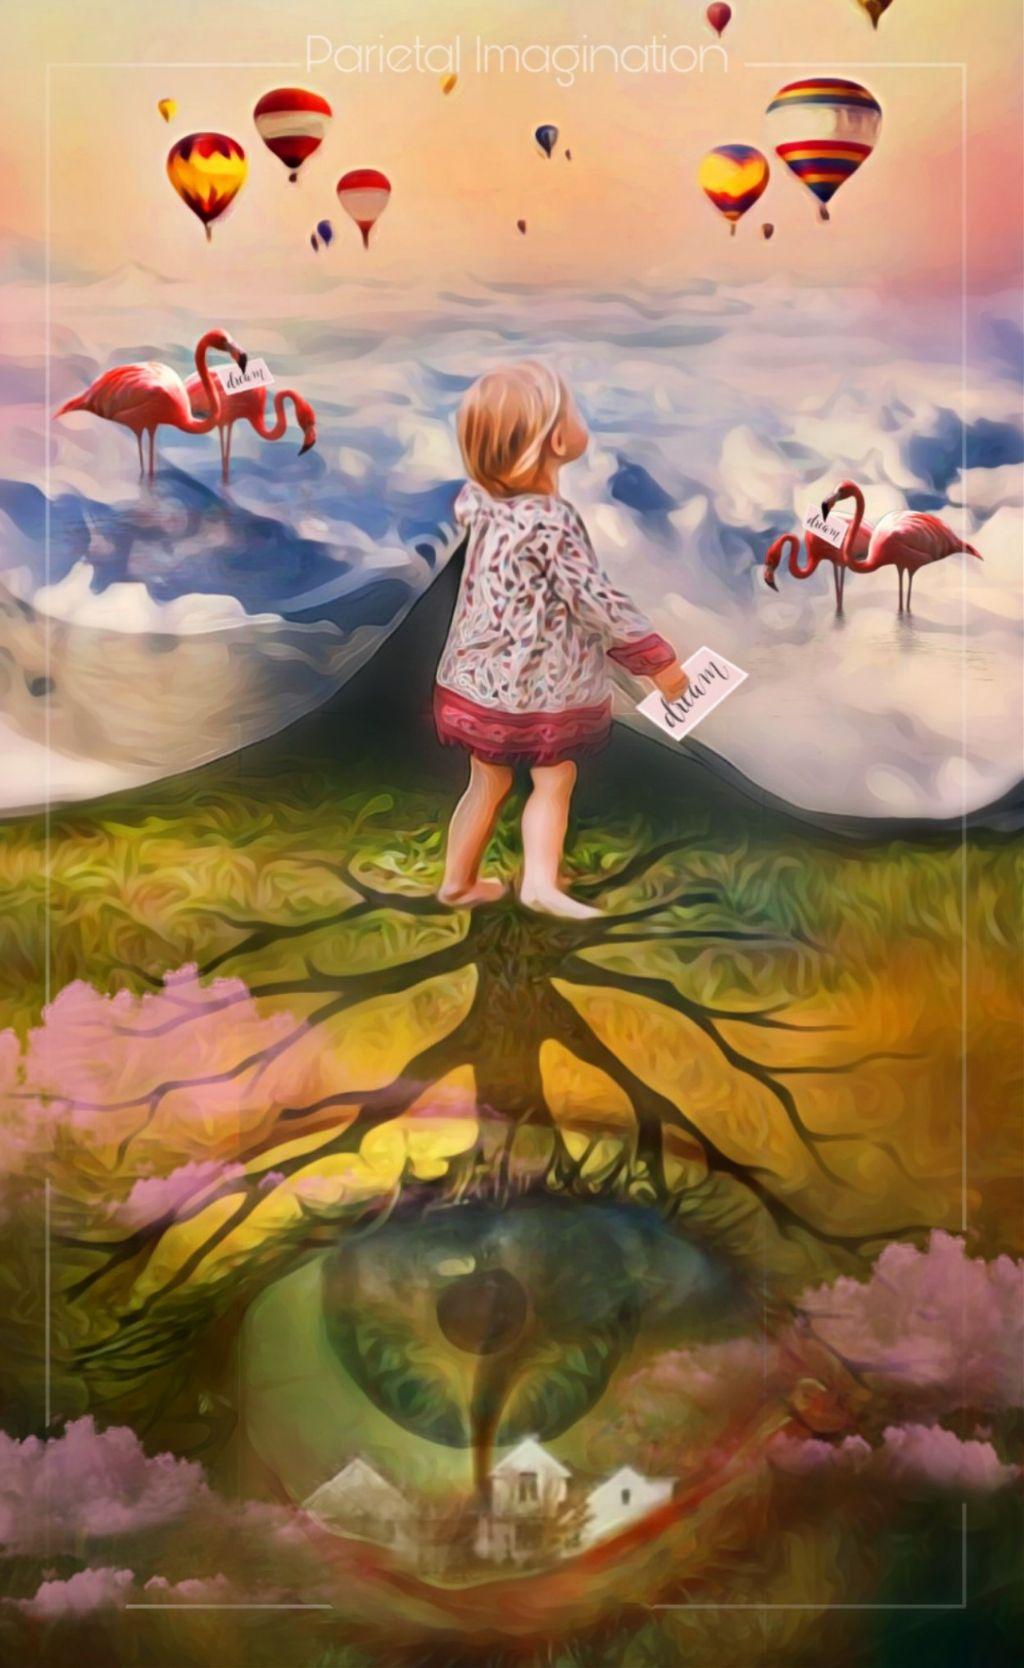 VOTING LINK: https://picsart.com/i/310698033211201?challenge_id=5dc1521ead9417690acab7d6 Edit by: Parietal Imagination Art  @pa, Credits: Abrahim Almahdi, Platon Yurich Remix #freetoedit  #ircpeachquartz #nature #girl #eye #fx #birds #roots #surreal #surrealism #madewithpicsart #vip #parietalimagination  💗💗💗💗💗